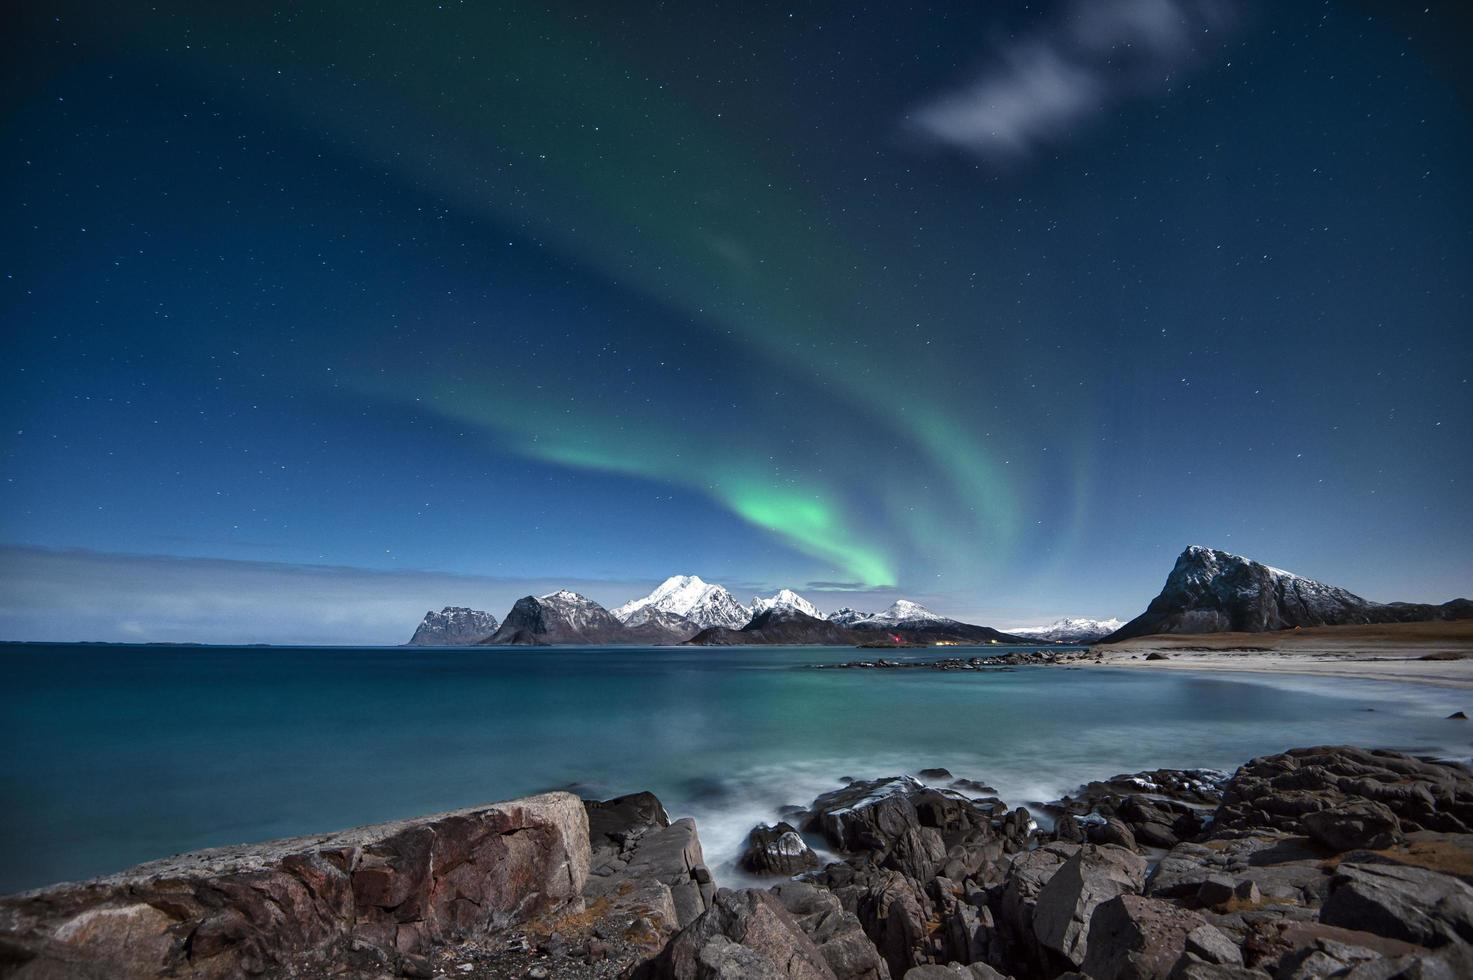 Aurora borealis at Lofoten Islands photo